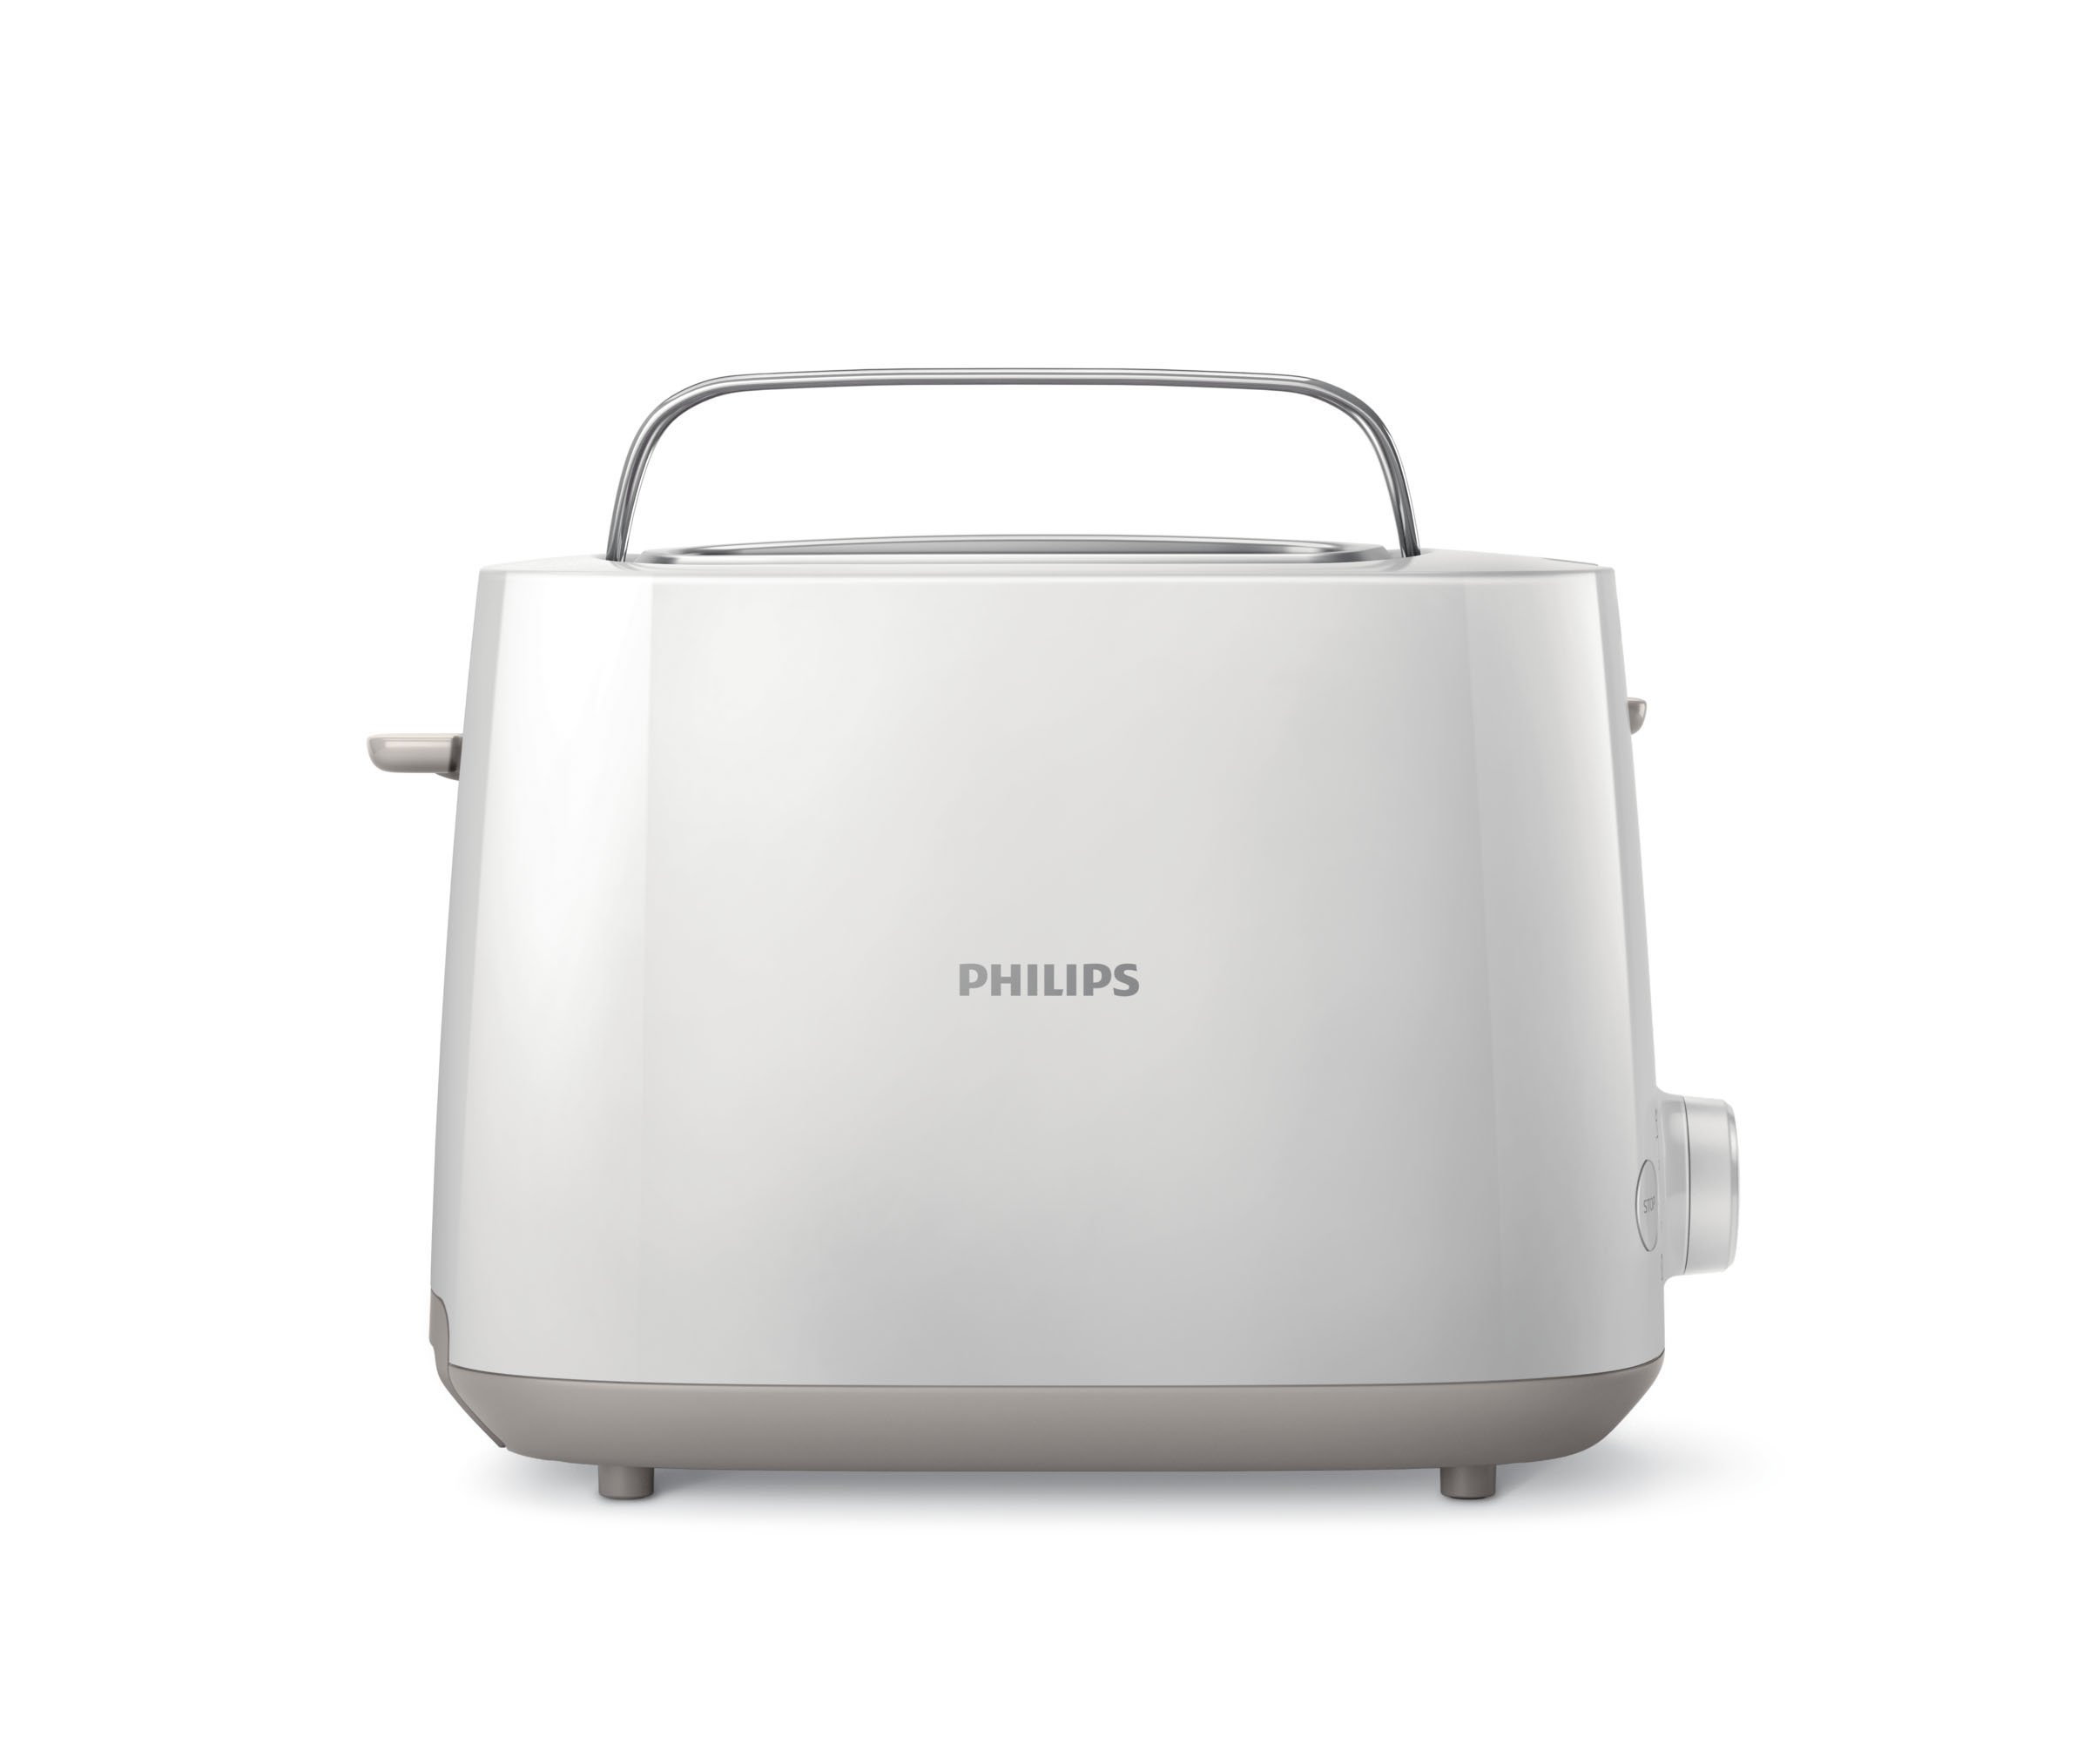 Philips Daily HD2581/00 -Tostador 830 W, Doble Ranura, Color Blanco: Philips: Amazon.es: Hogar